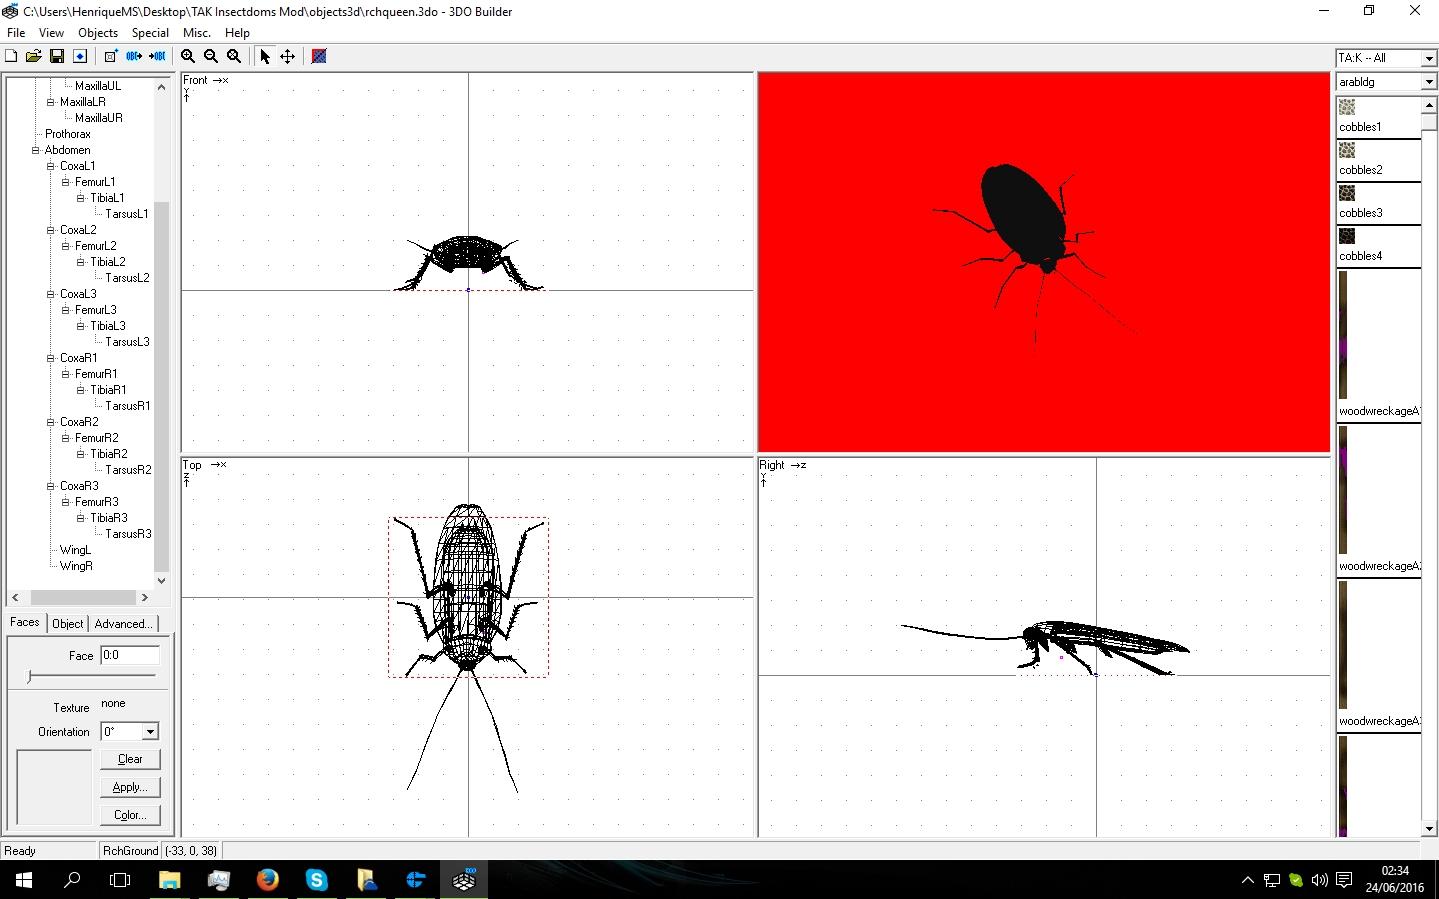 Total Annihilation: Insectdoms Mod 36c9a4dac1c049fcbc9d6c19eea2ddf2